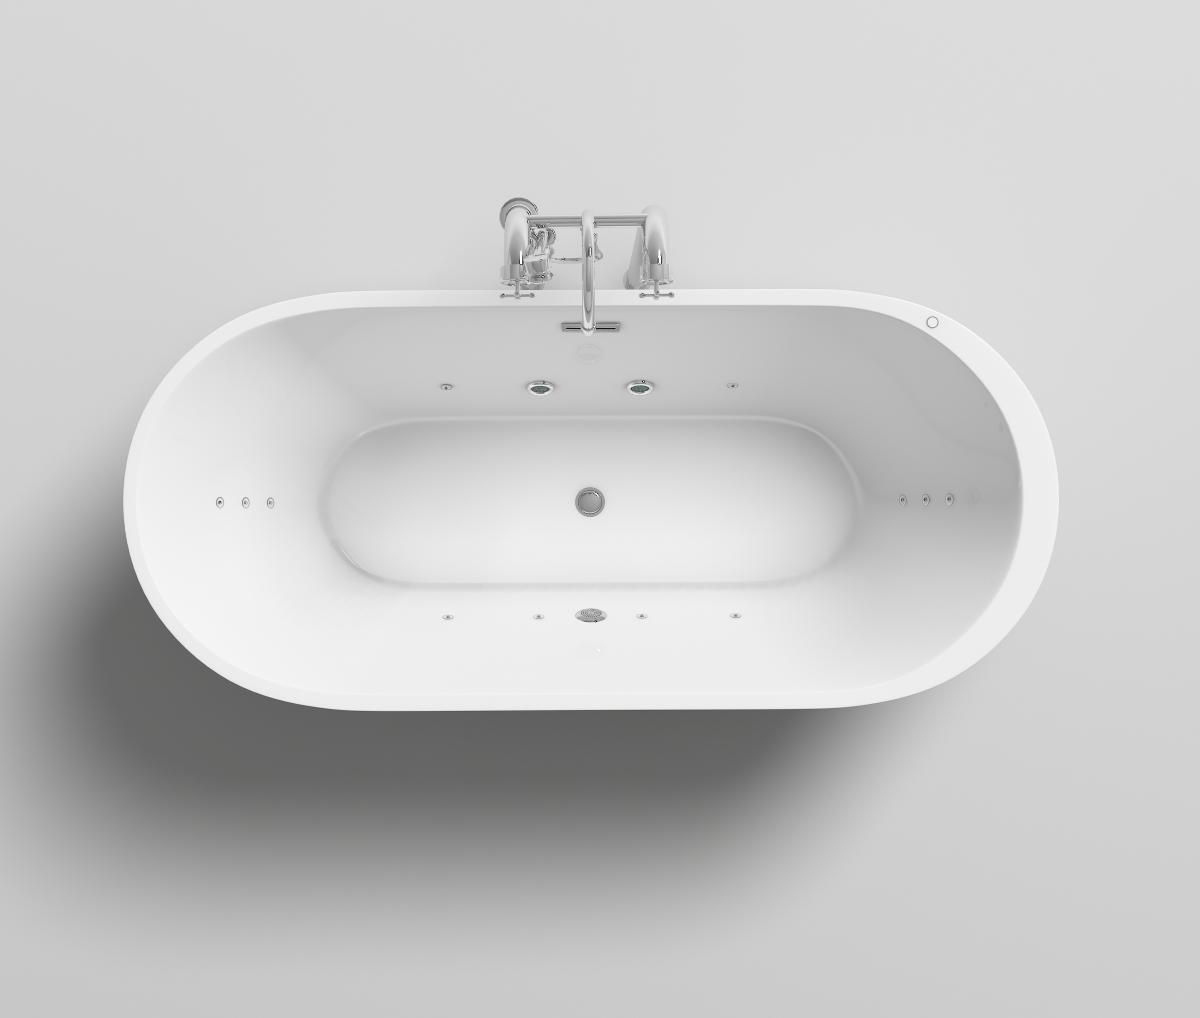 freistehender luxus whirlpool badewanne bern freistehend. Black Bedroom Furniture Sets. Home Design Ideas